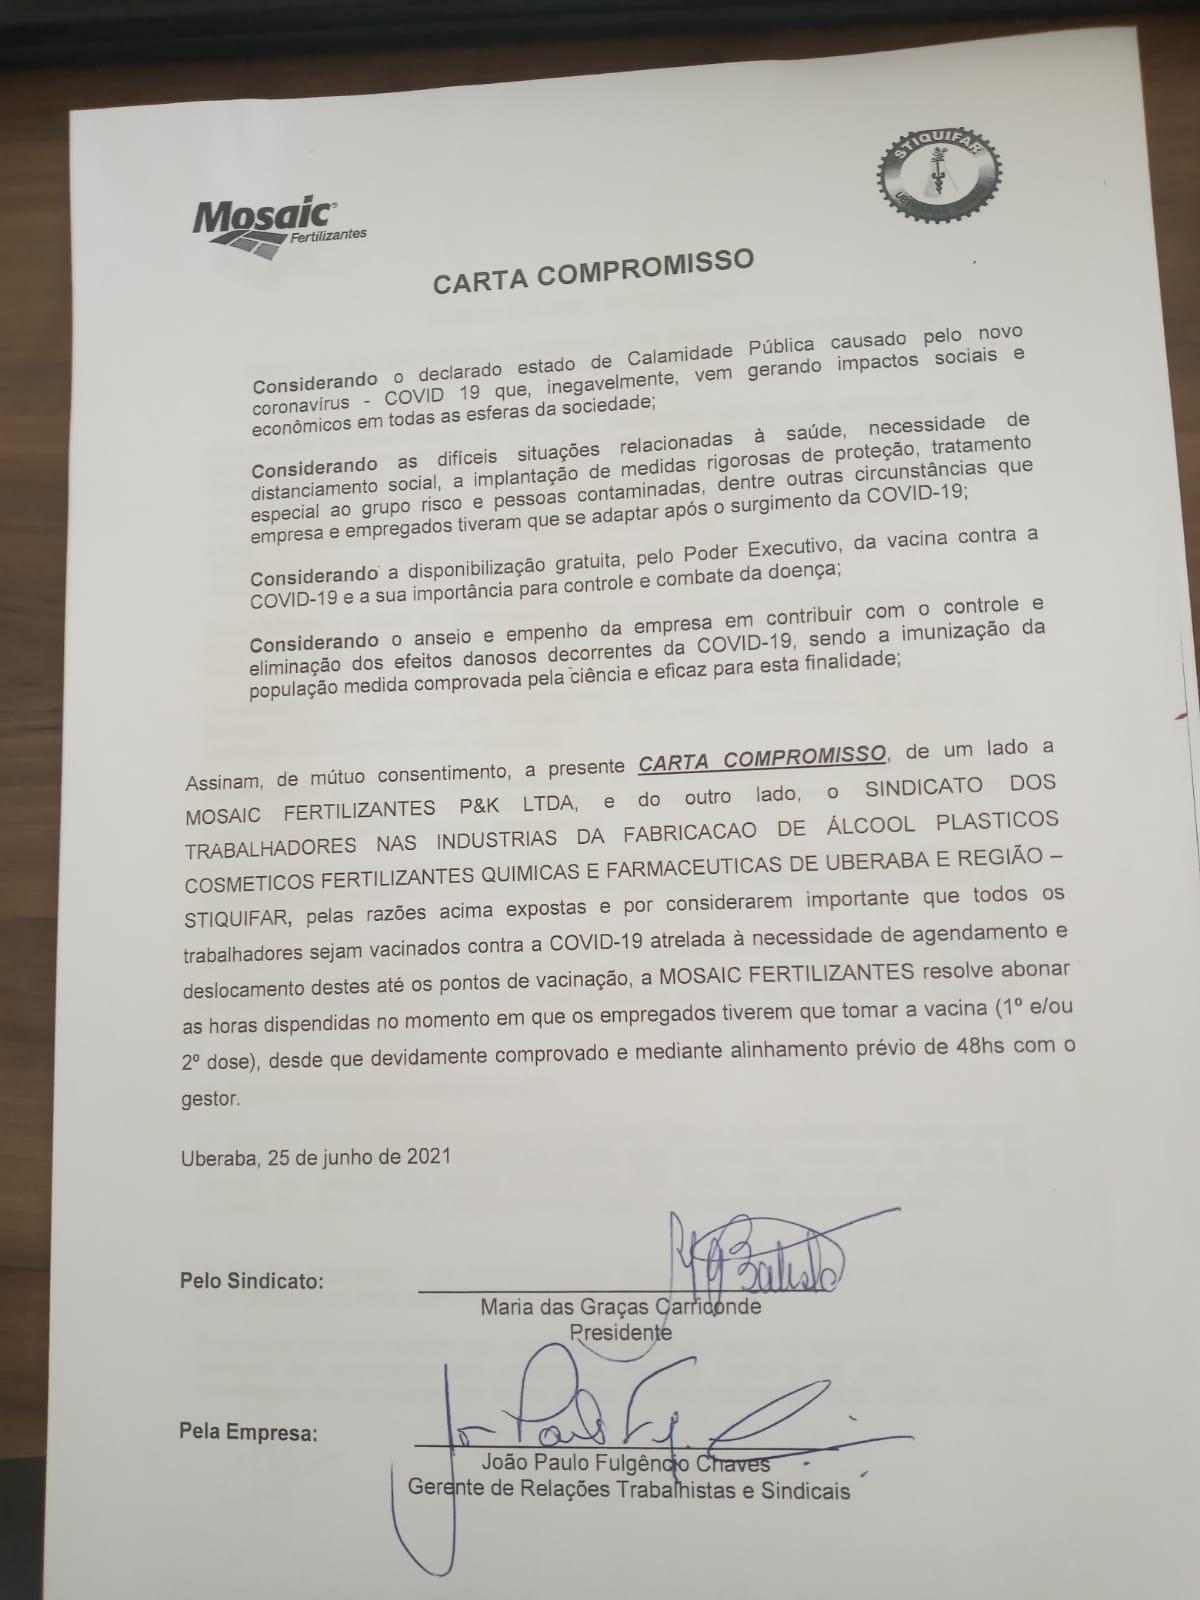 Stiquifar e Mosaic Fertilizantes firma compromisso de trabalhadores serem imunizados contra Covid-19